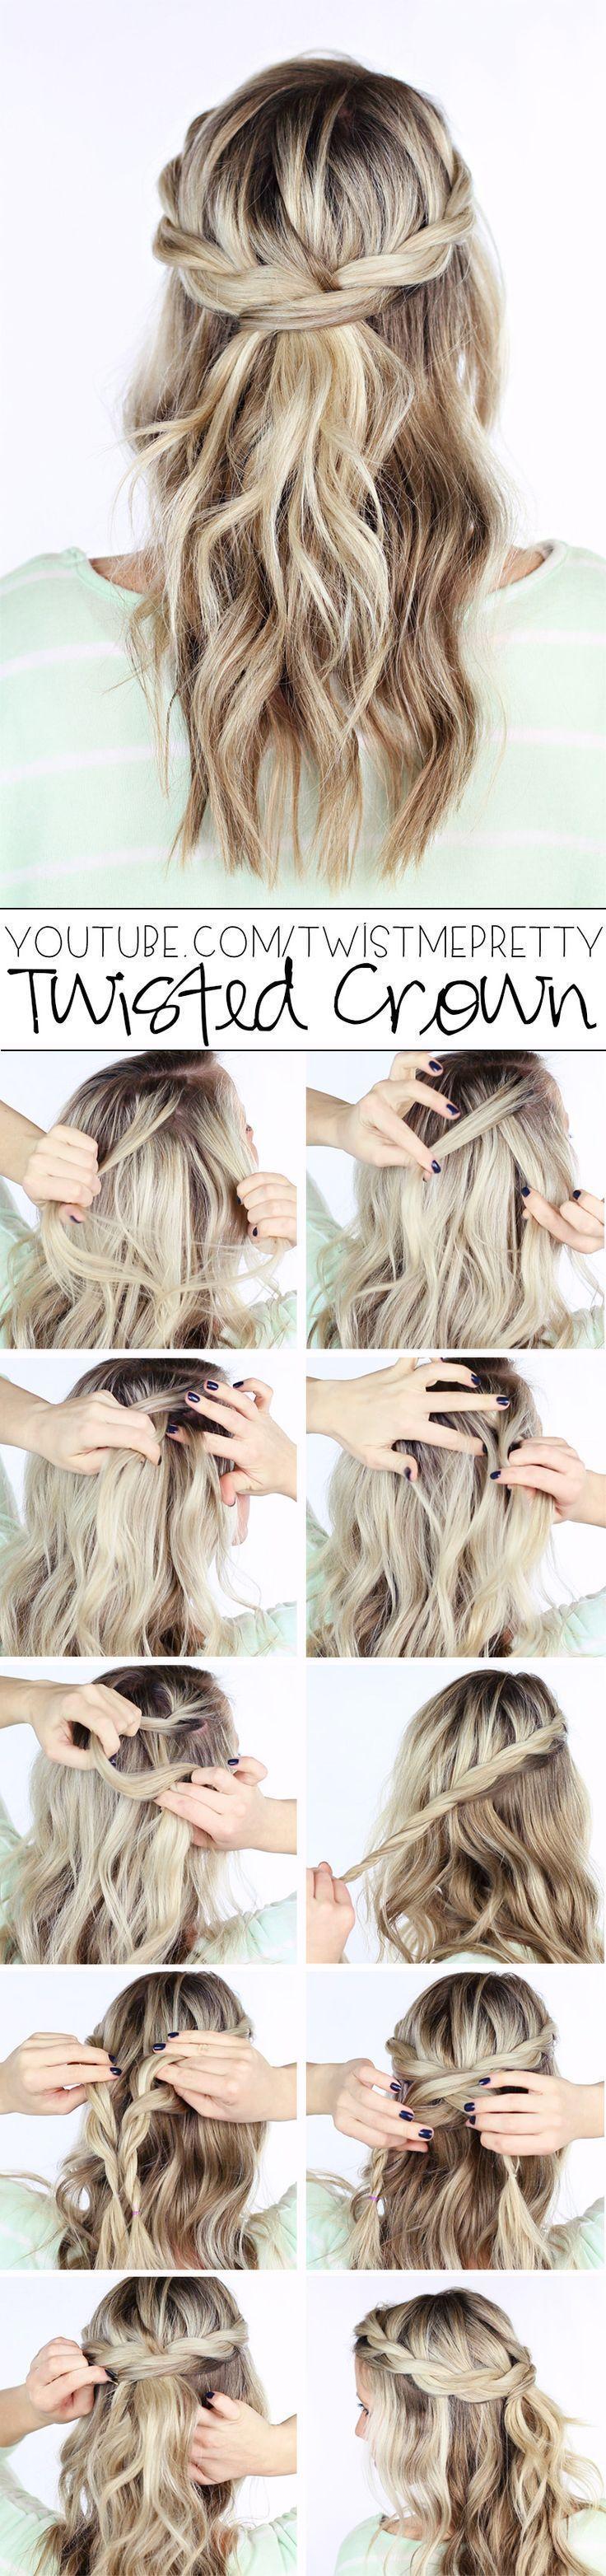 easy hairstyles for girls with tutorials frisuren pinterest